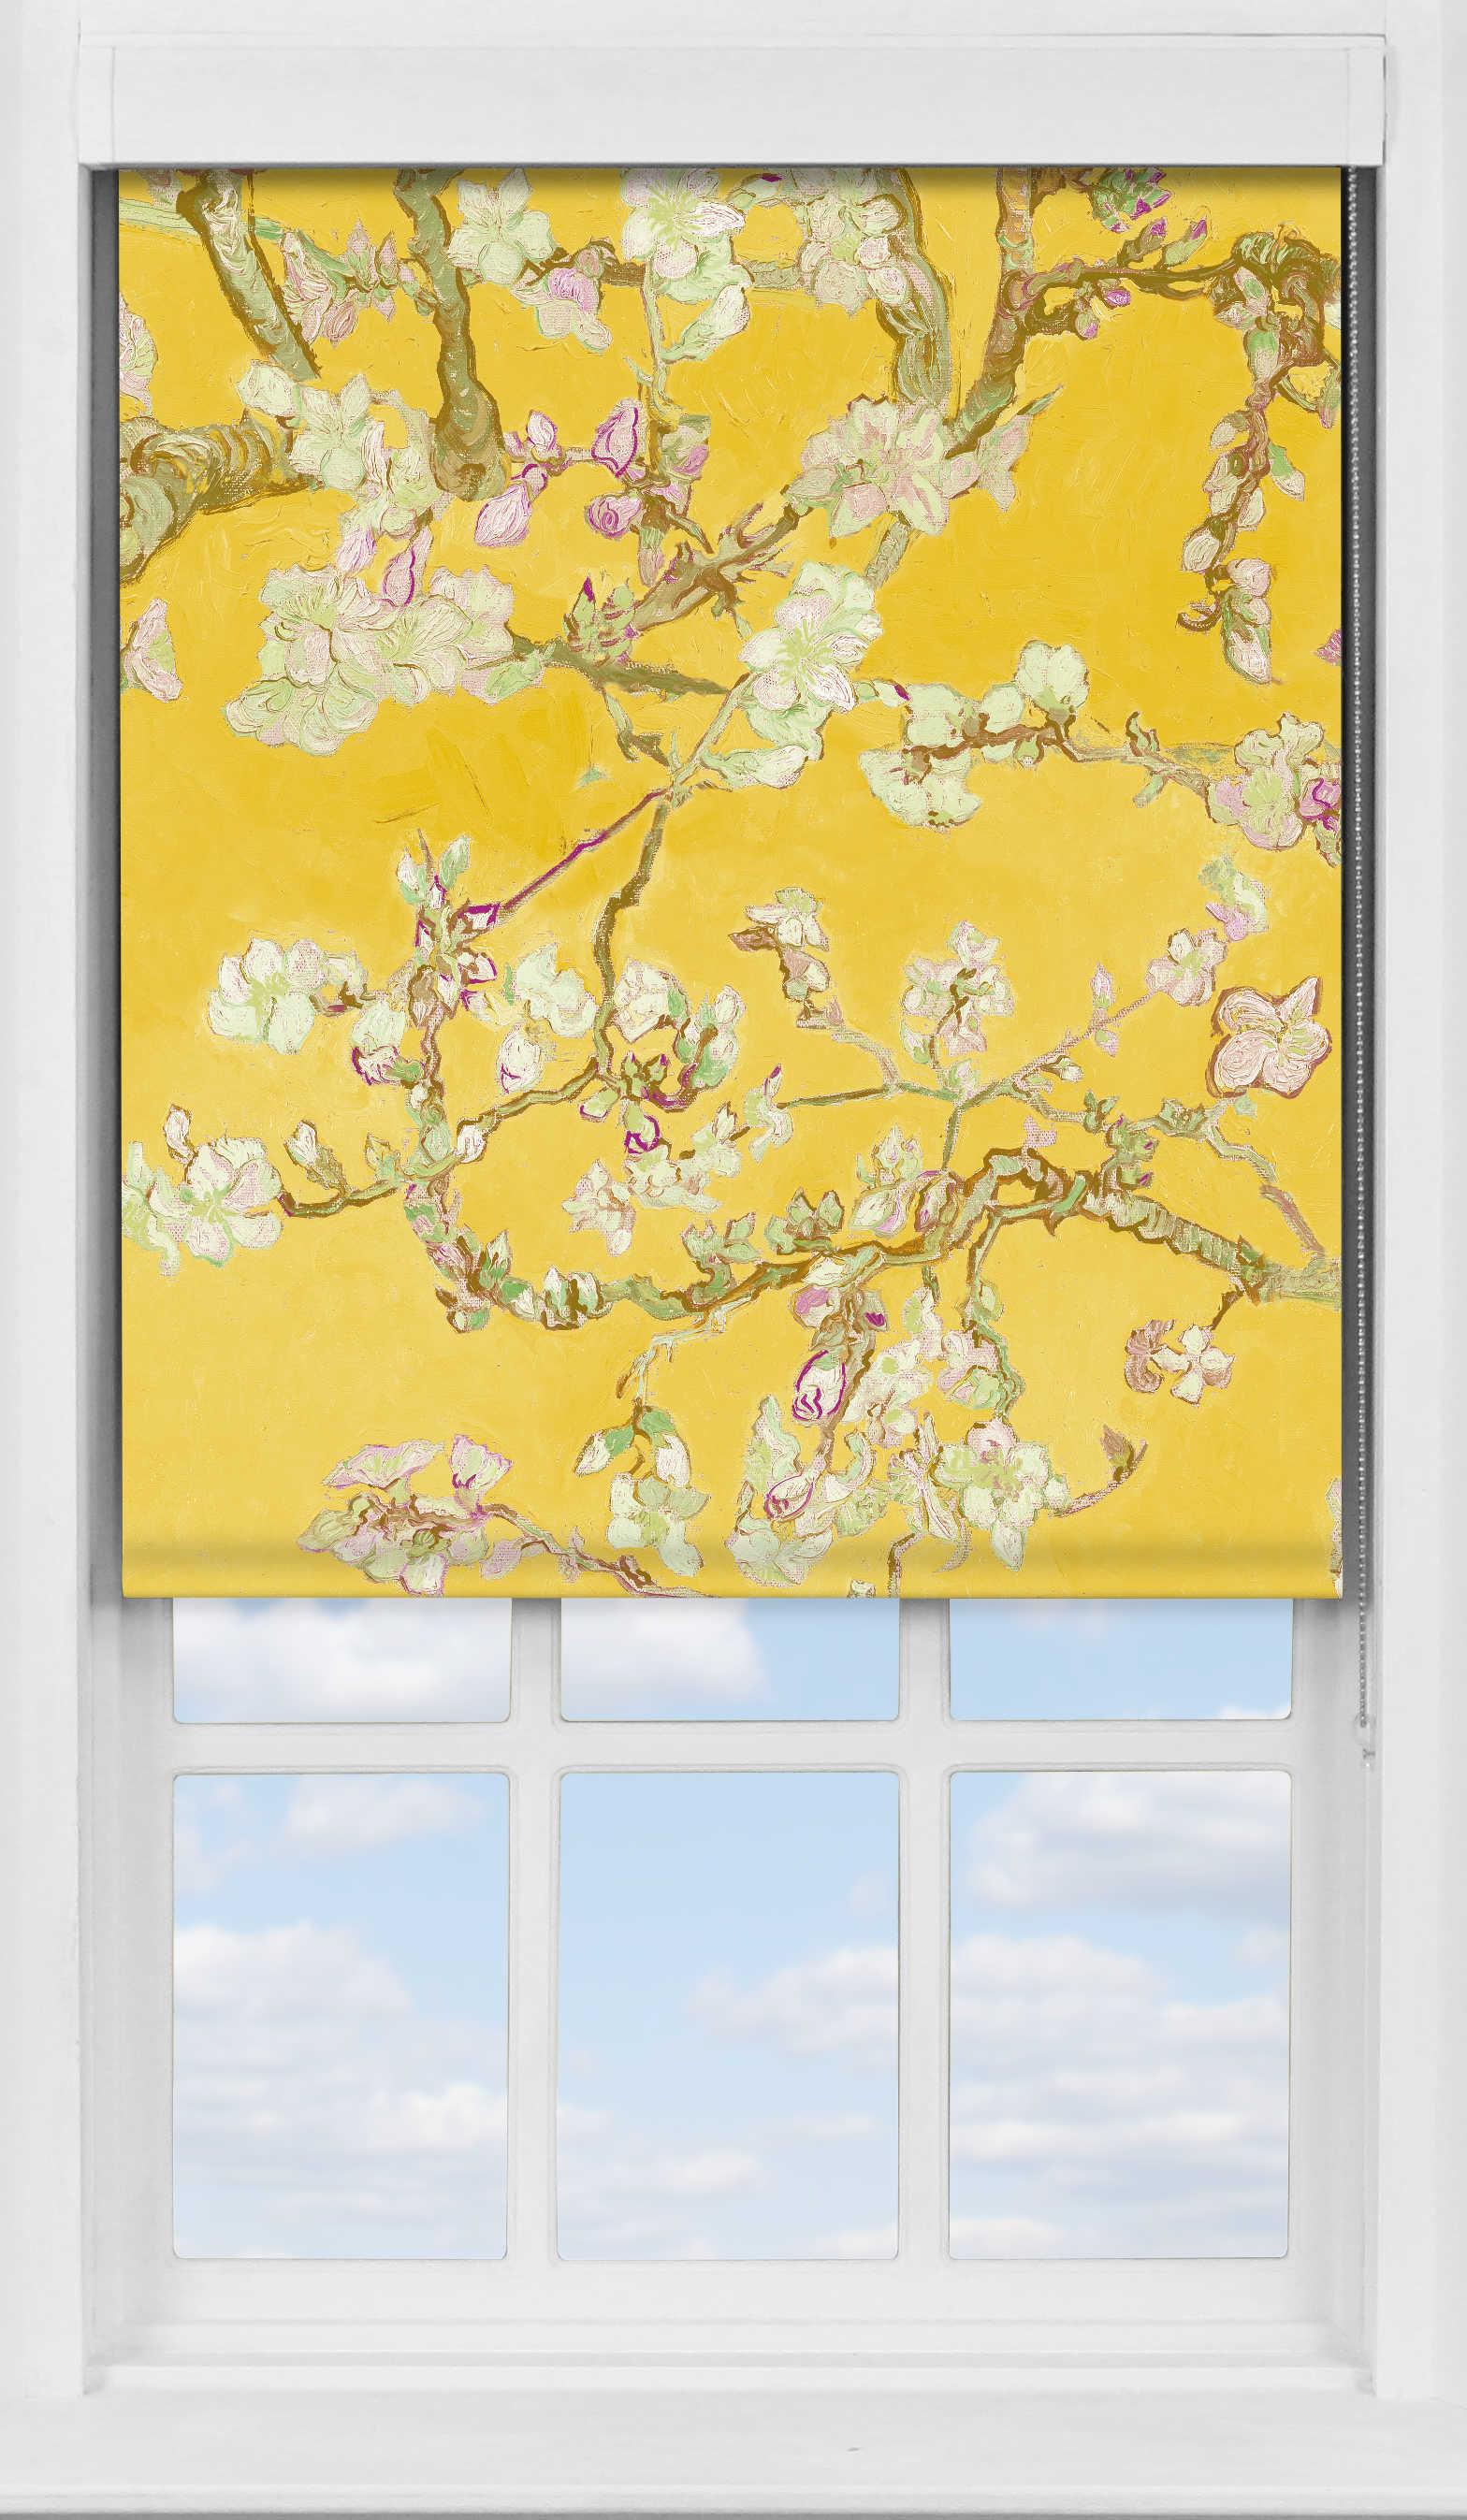 Premium Roller Blind in Van Gogh Almond Blossom Yellow Translucent